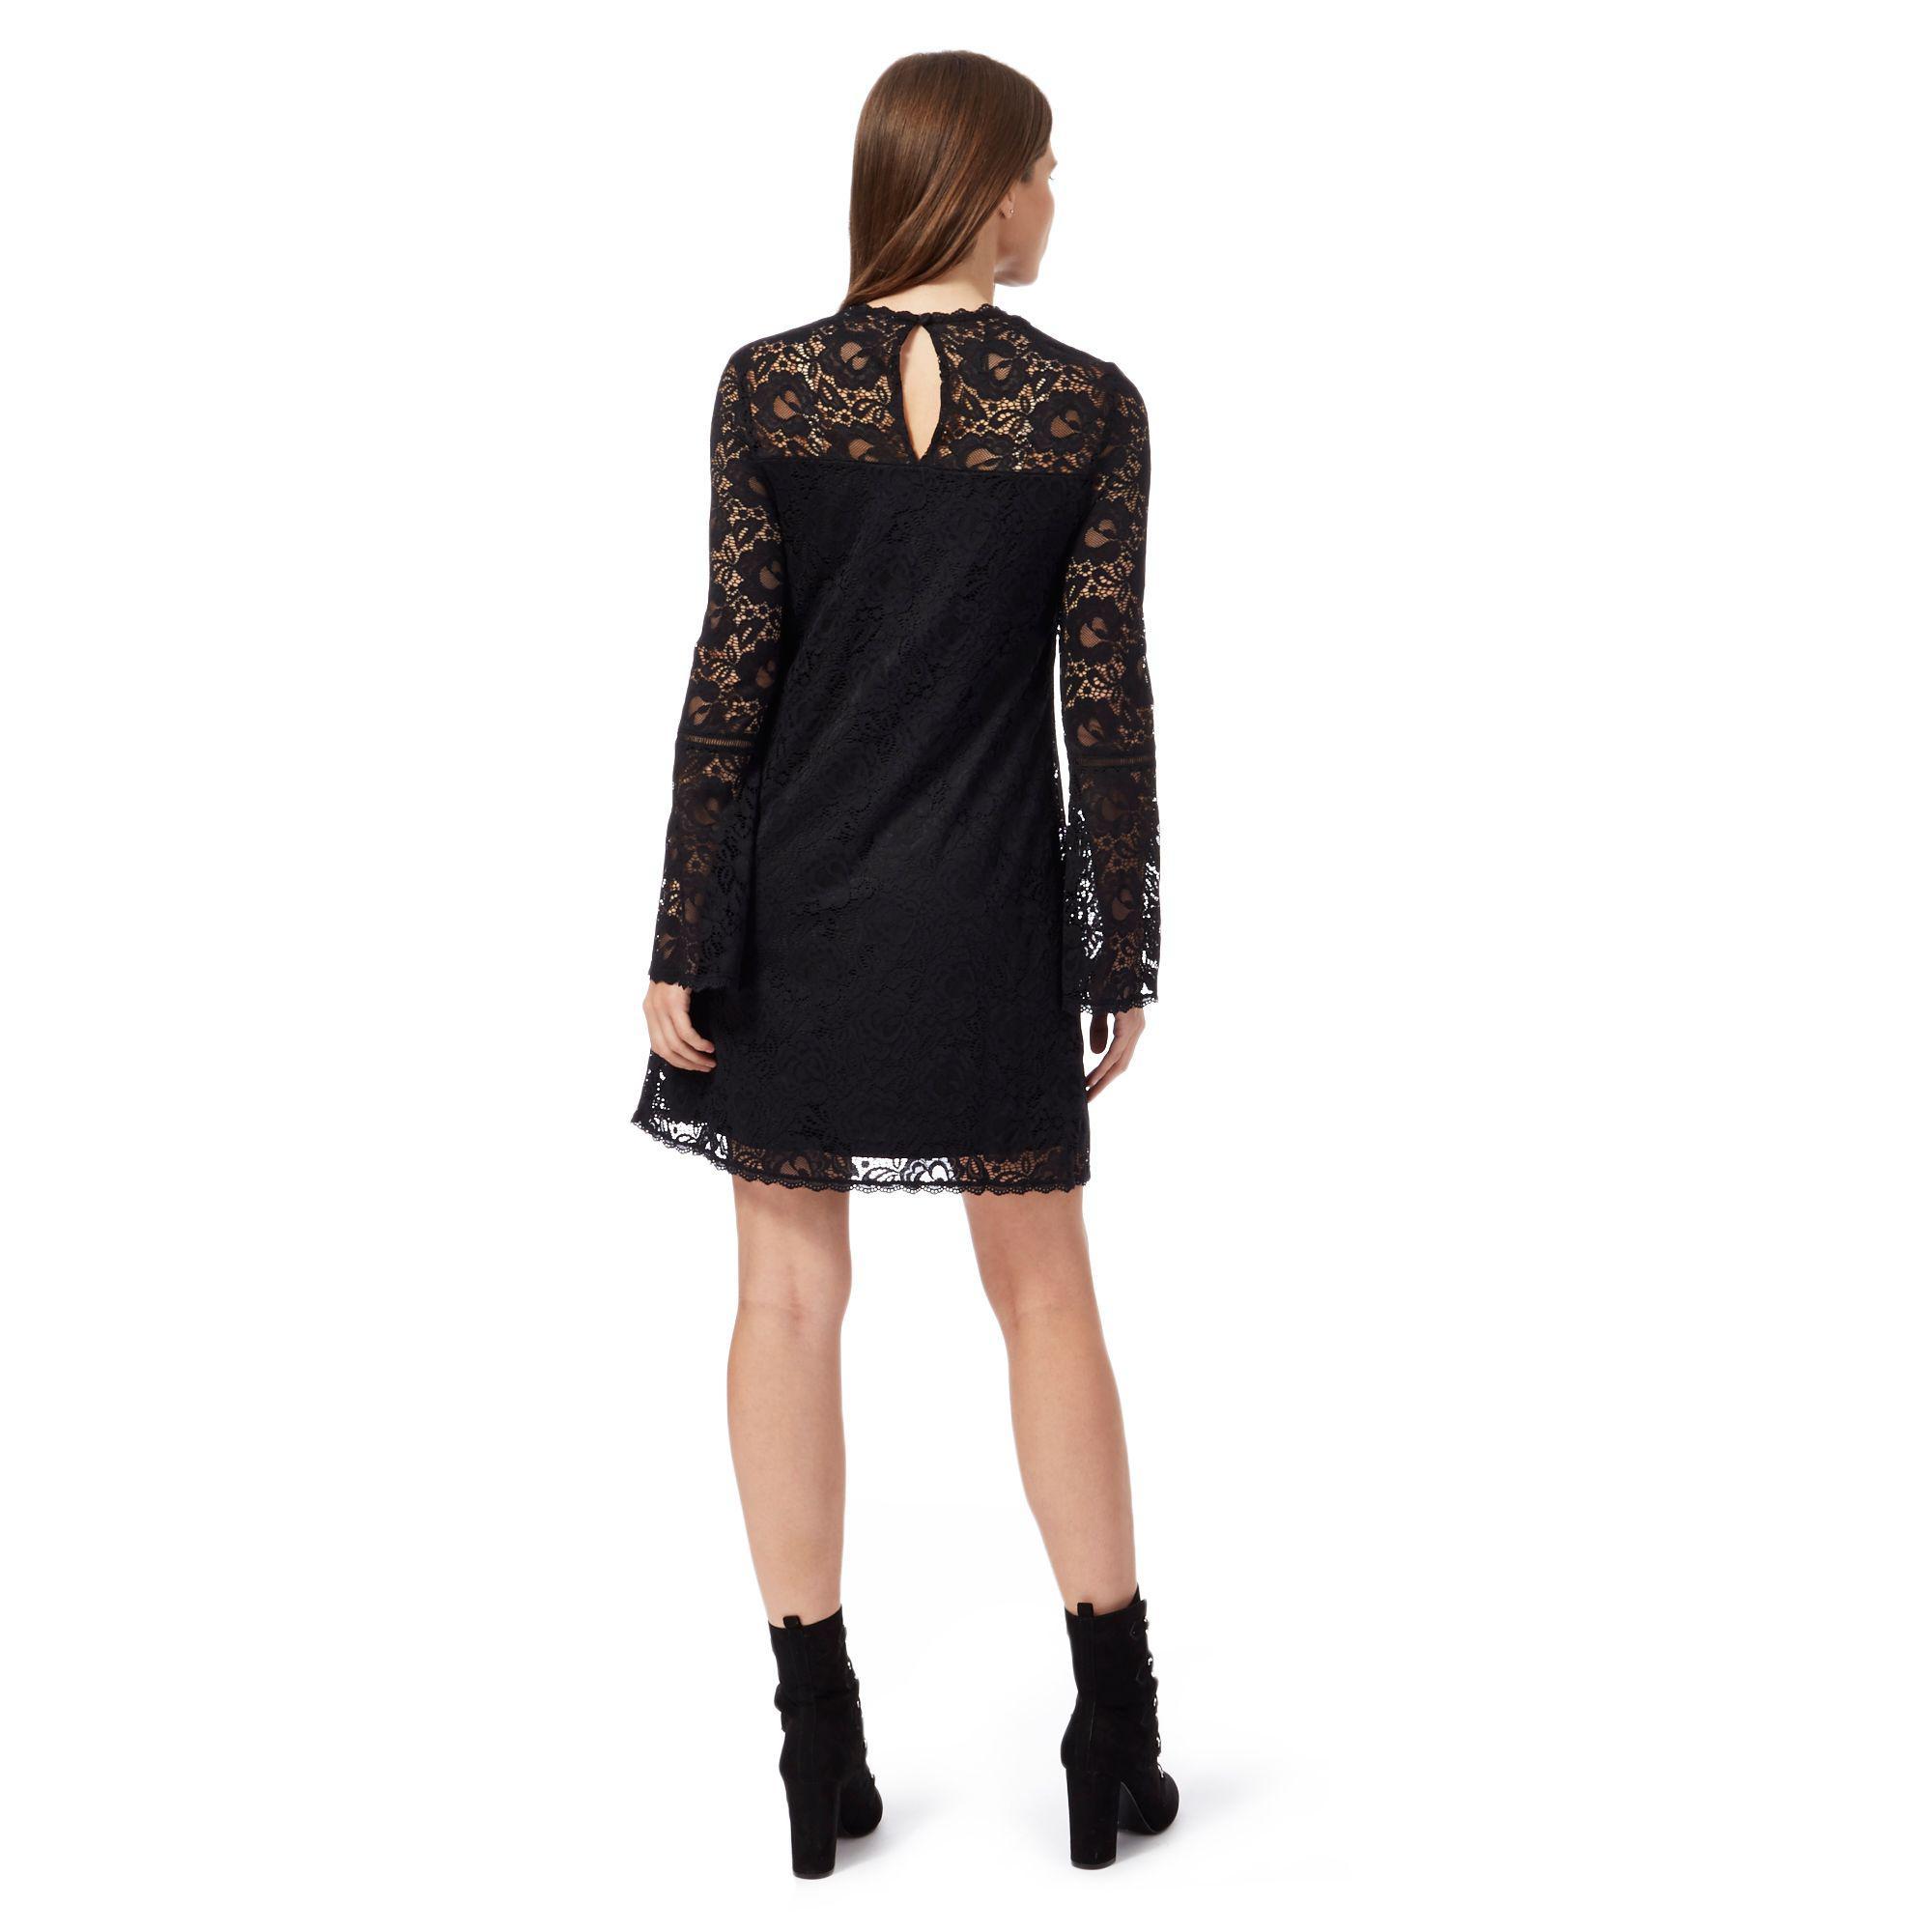 f7e315ac12e Red Herring Black Lace High Neck Long Sleeves Mini Dress in Black - Lyst